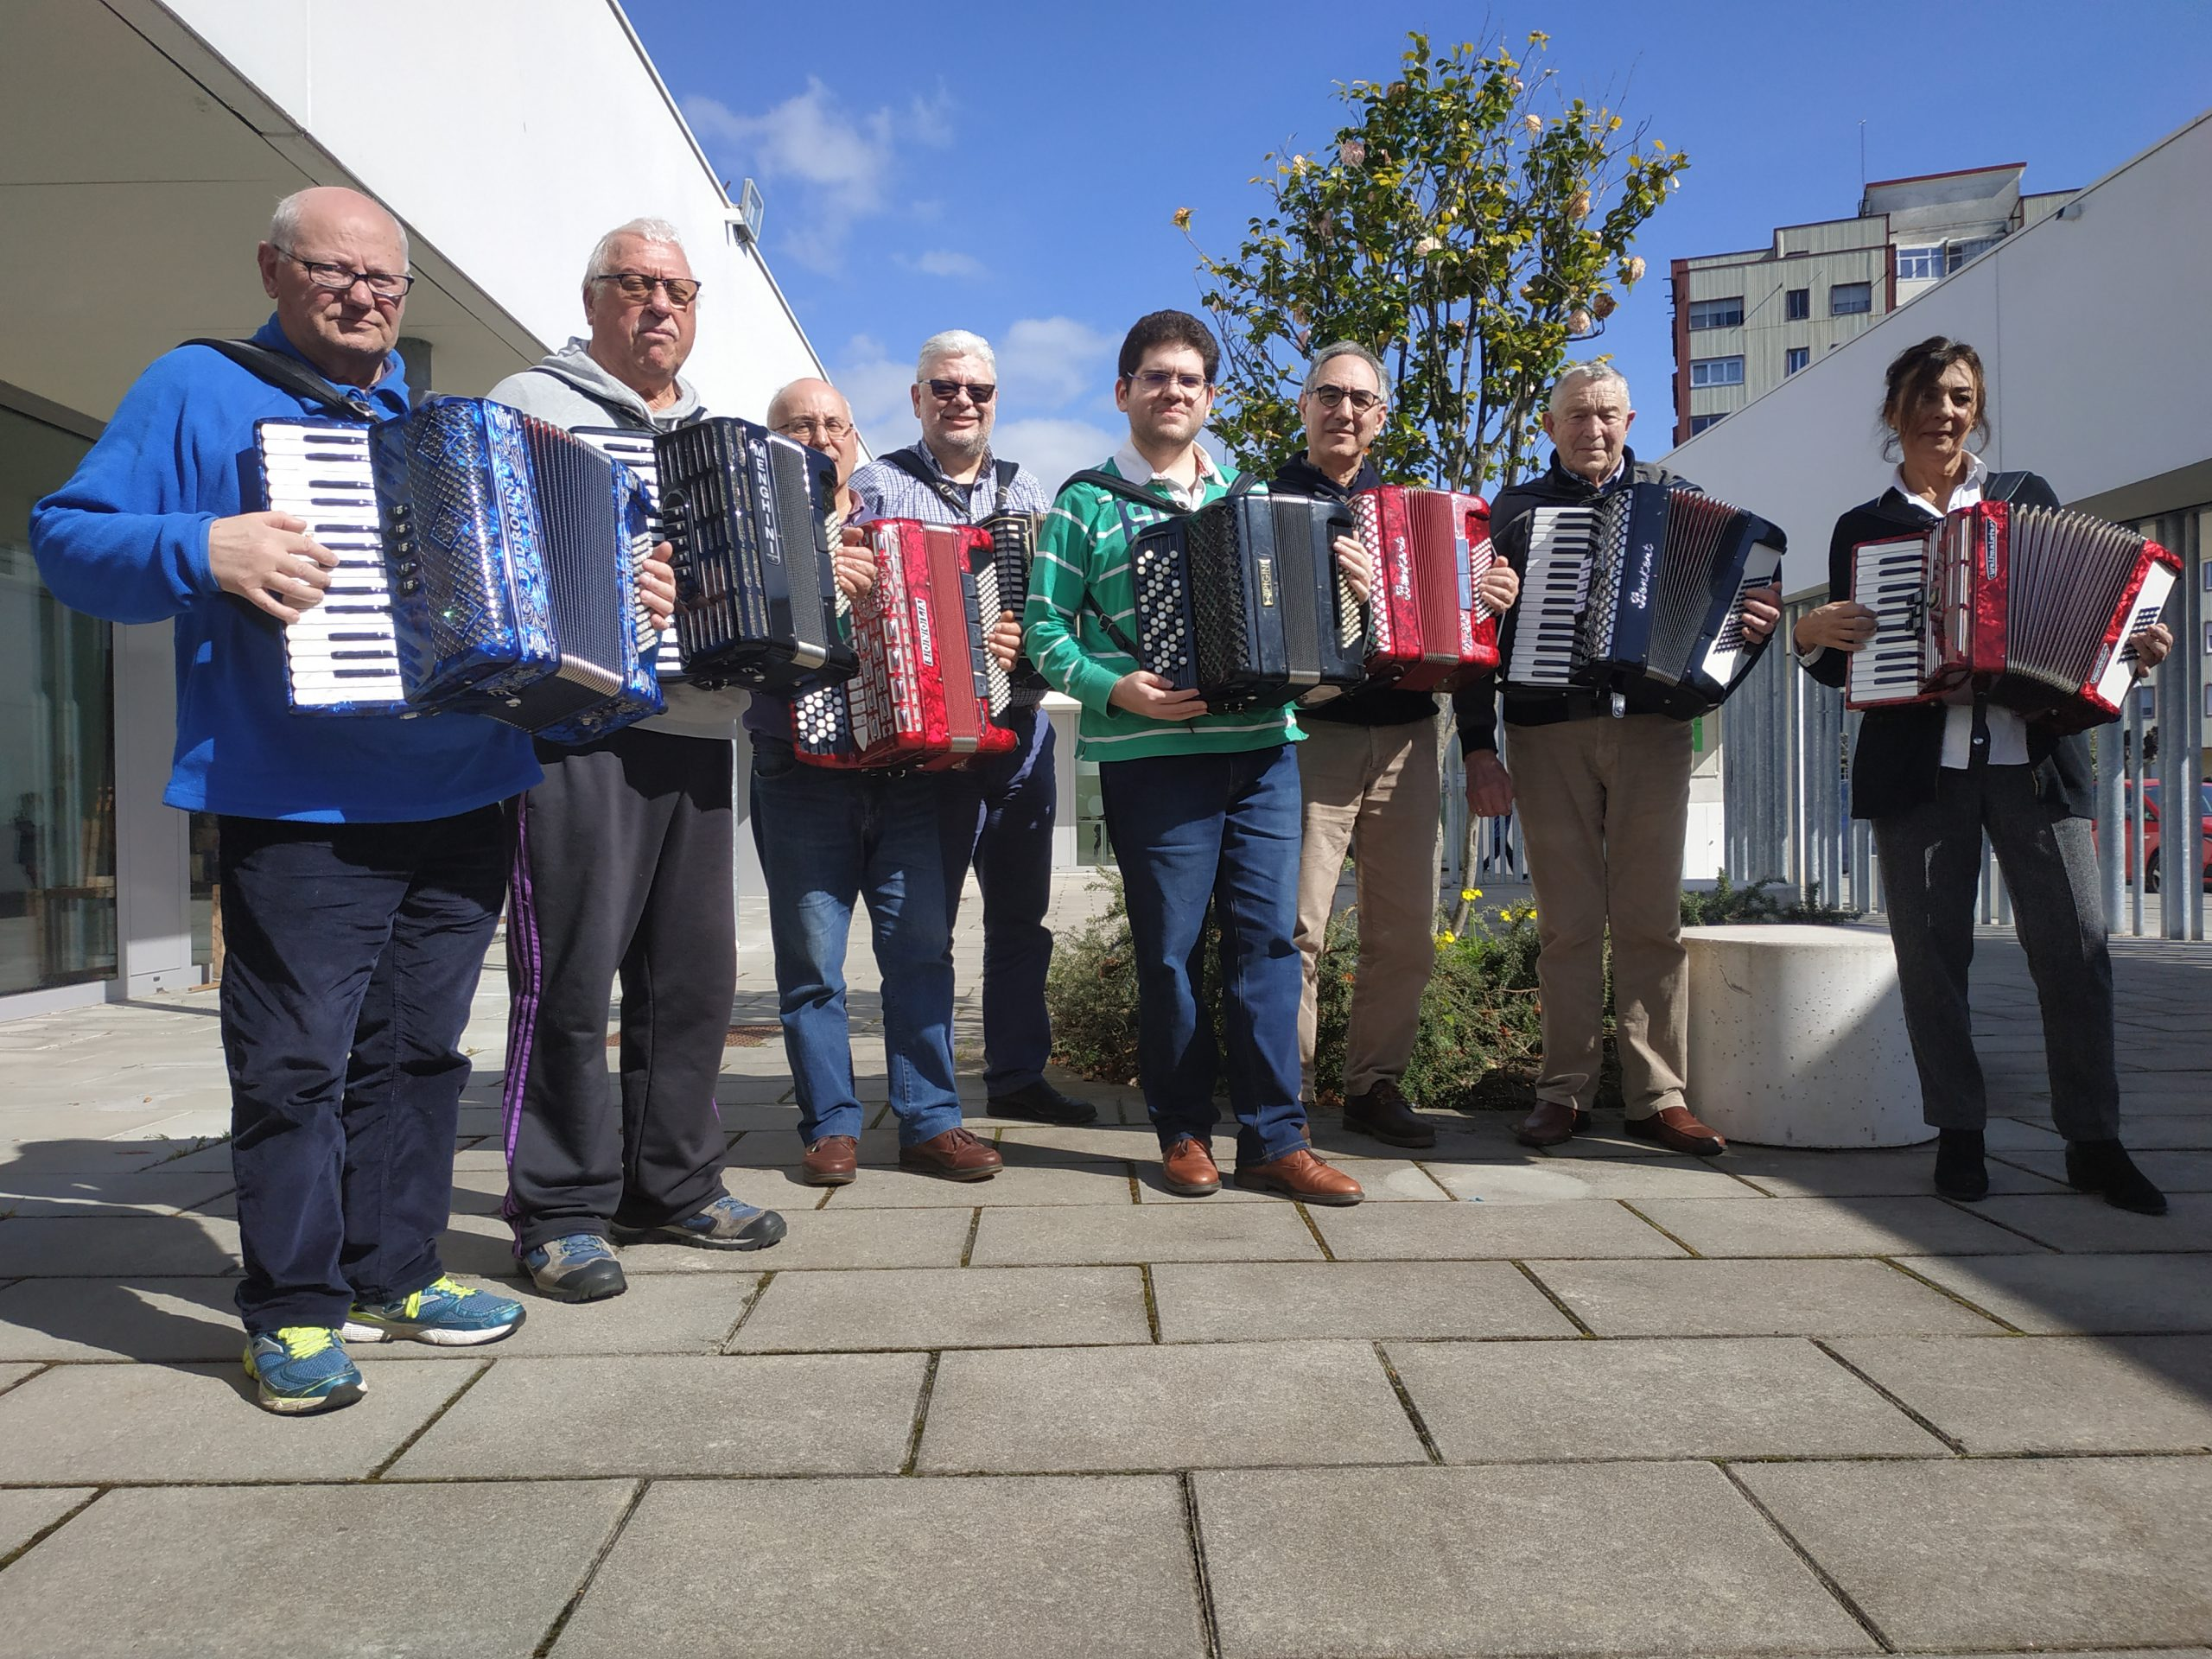 A Asociación de acordeonistas de Ferrol súmase mañá á iniciativa#maiosnaxanela